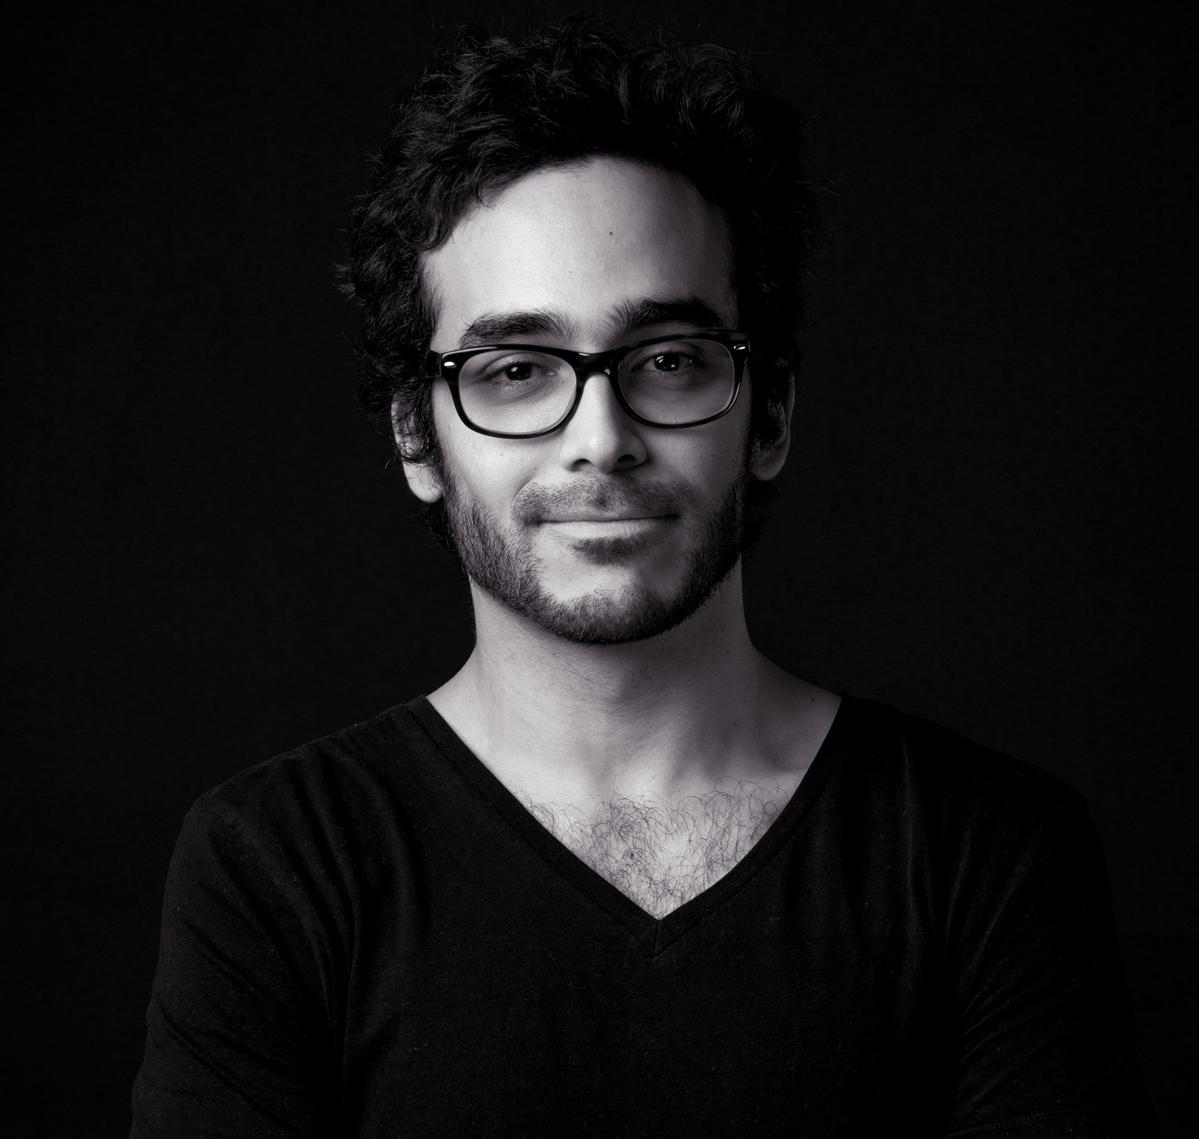 Oliver Olivo